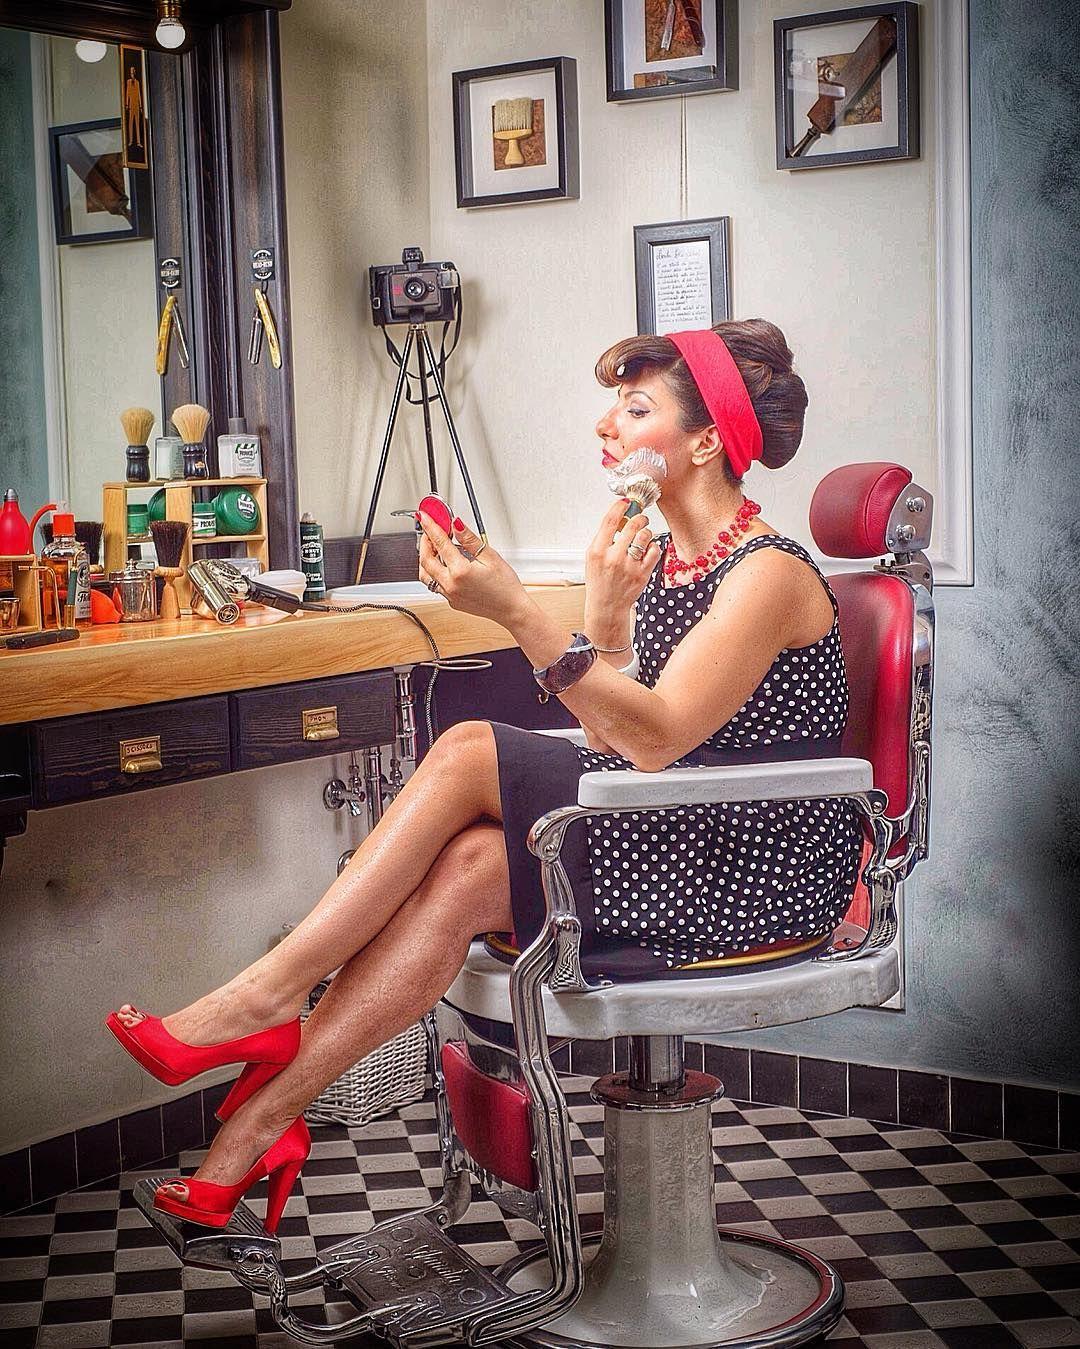 Pin By Iffah Fathin On Style: BarberChair-PinUp #woman #barbershop #naples #headrush